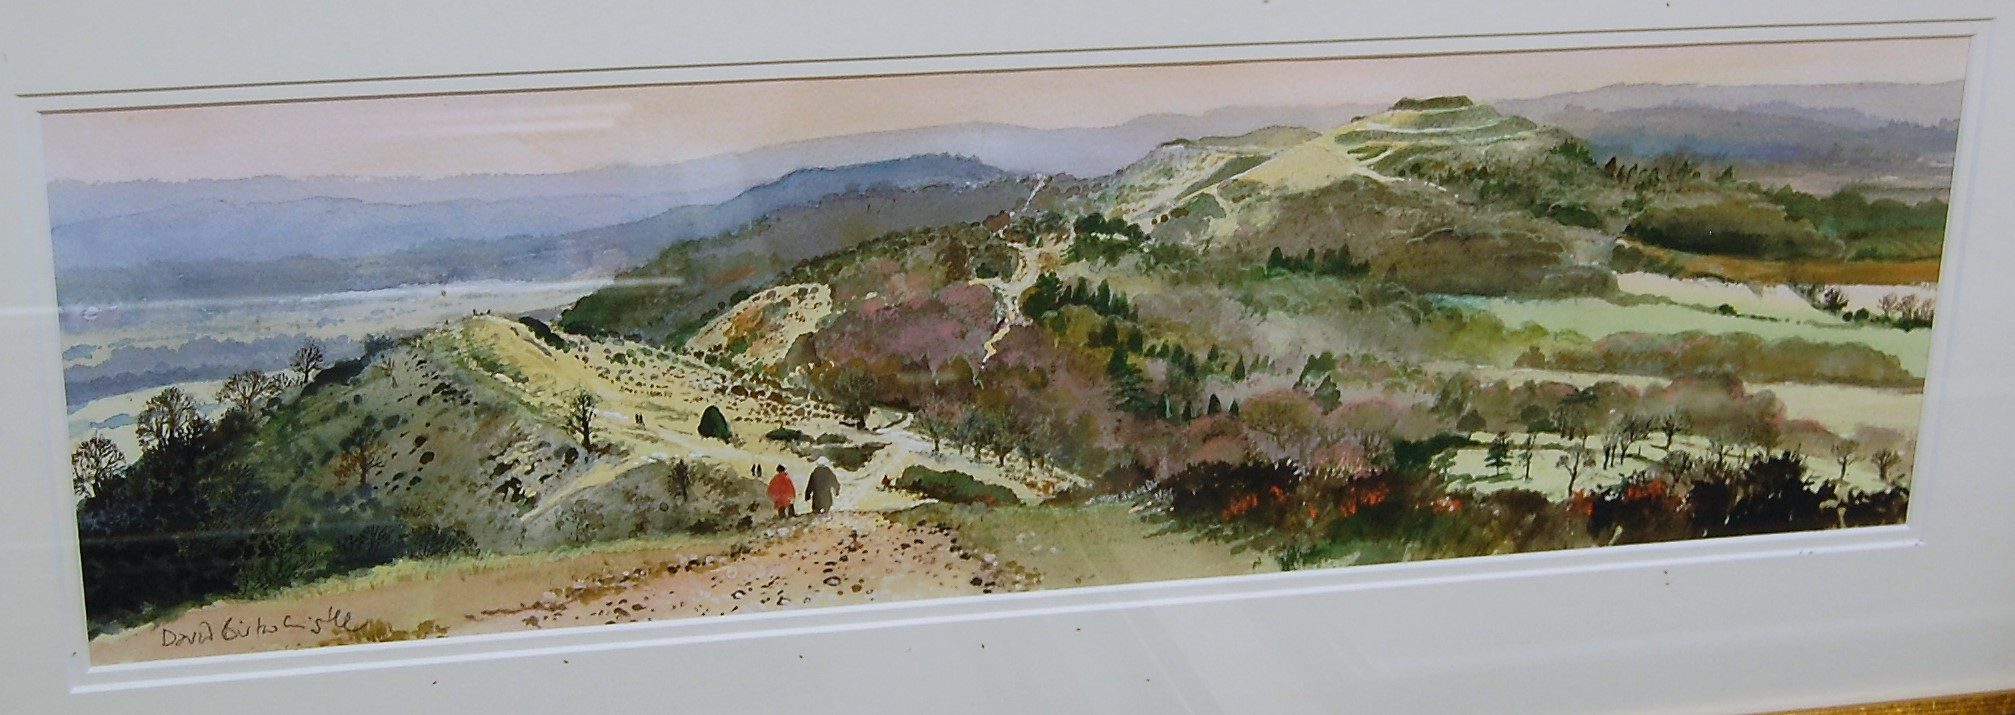 Lot 1042 - David Birtwhistle - Winter walk along the Malvern Ridge, watercolour, signed lower left, 16 x 53.